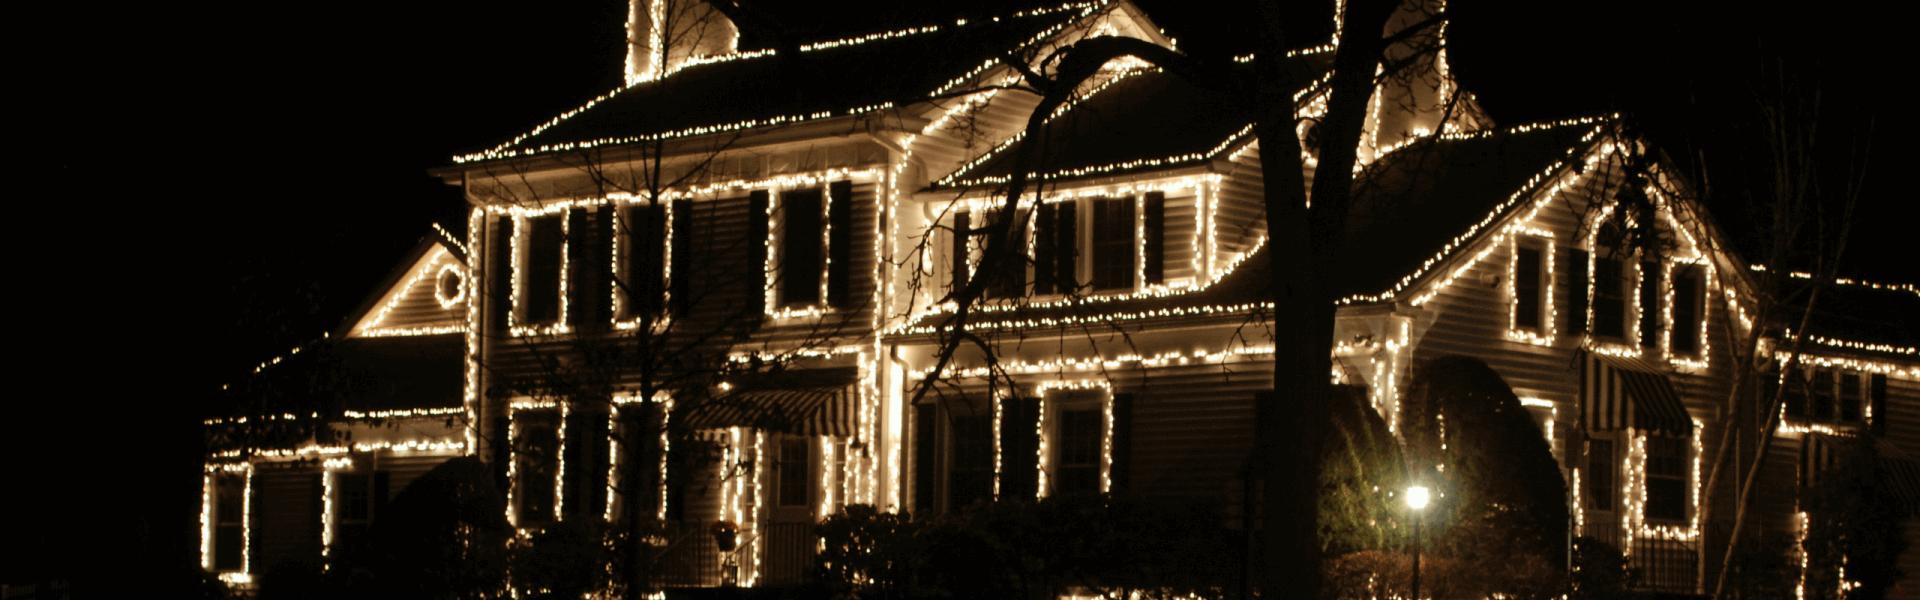 Christmas Lights Boise.Hiring Someone Else To Install Your Christmas Lights